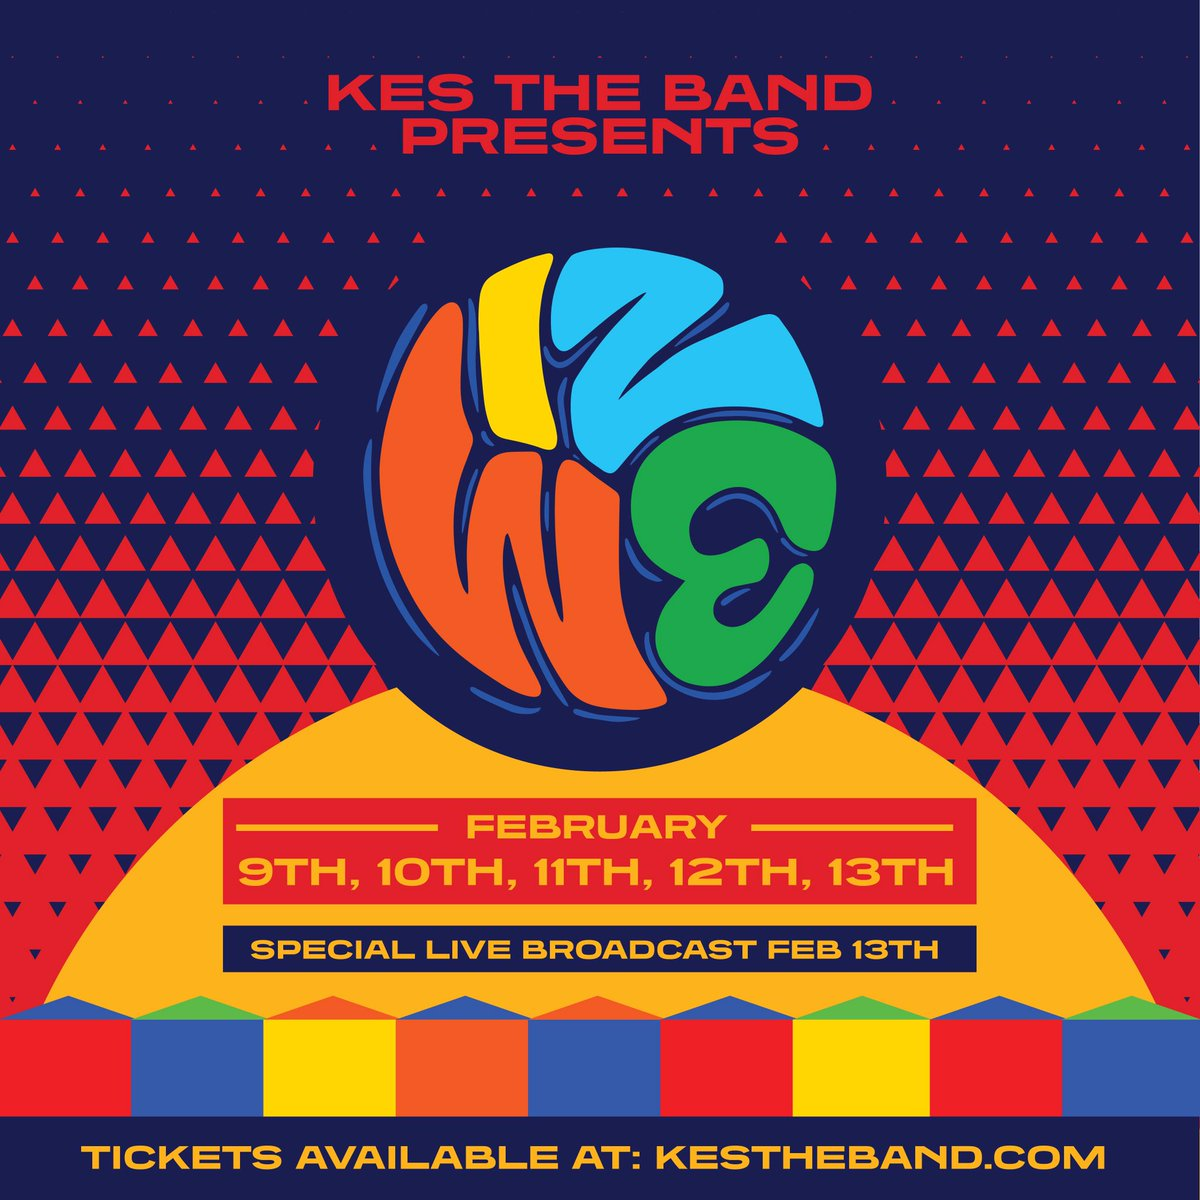 Kes The Band IzWe